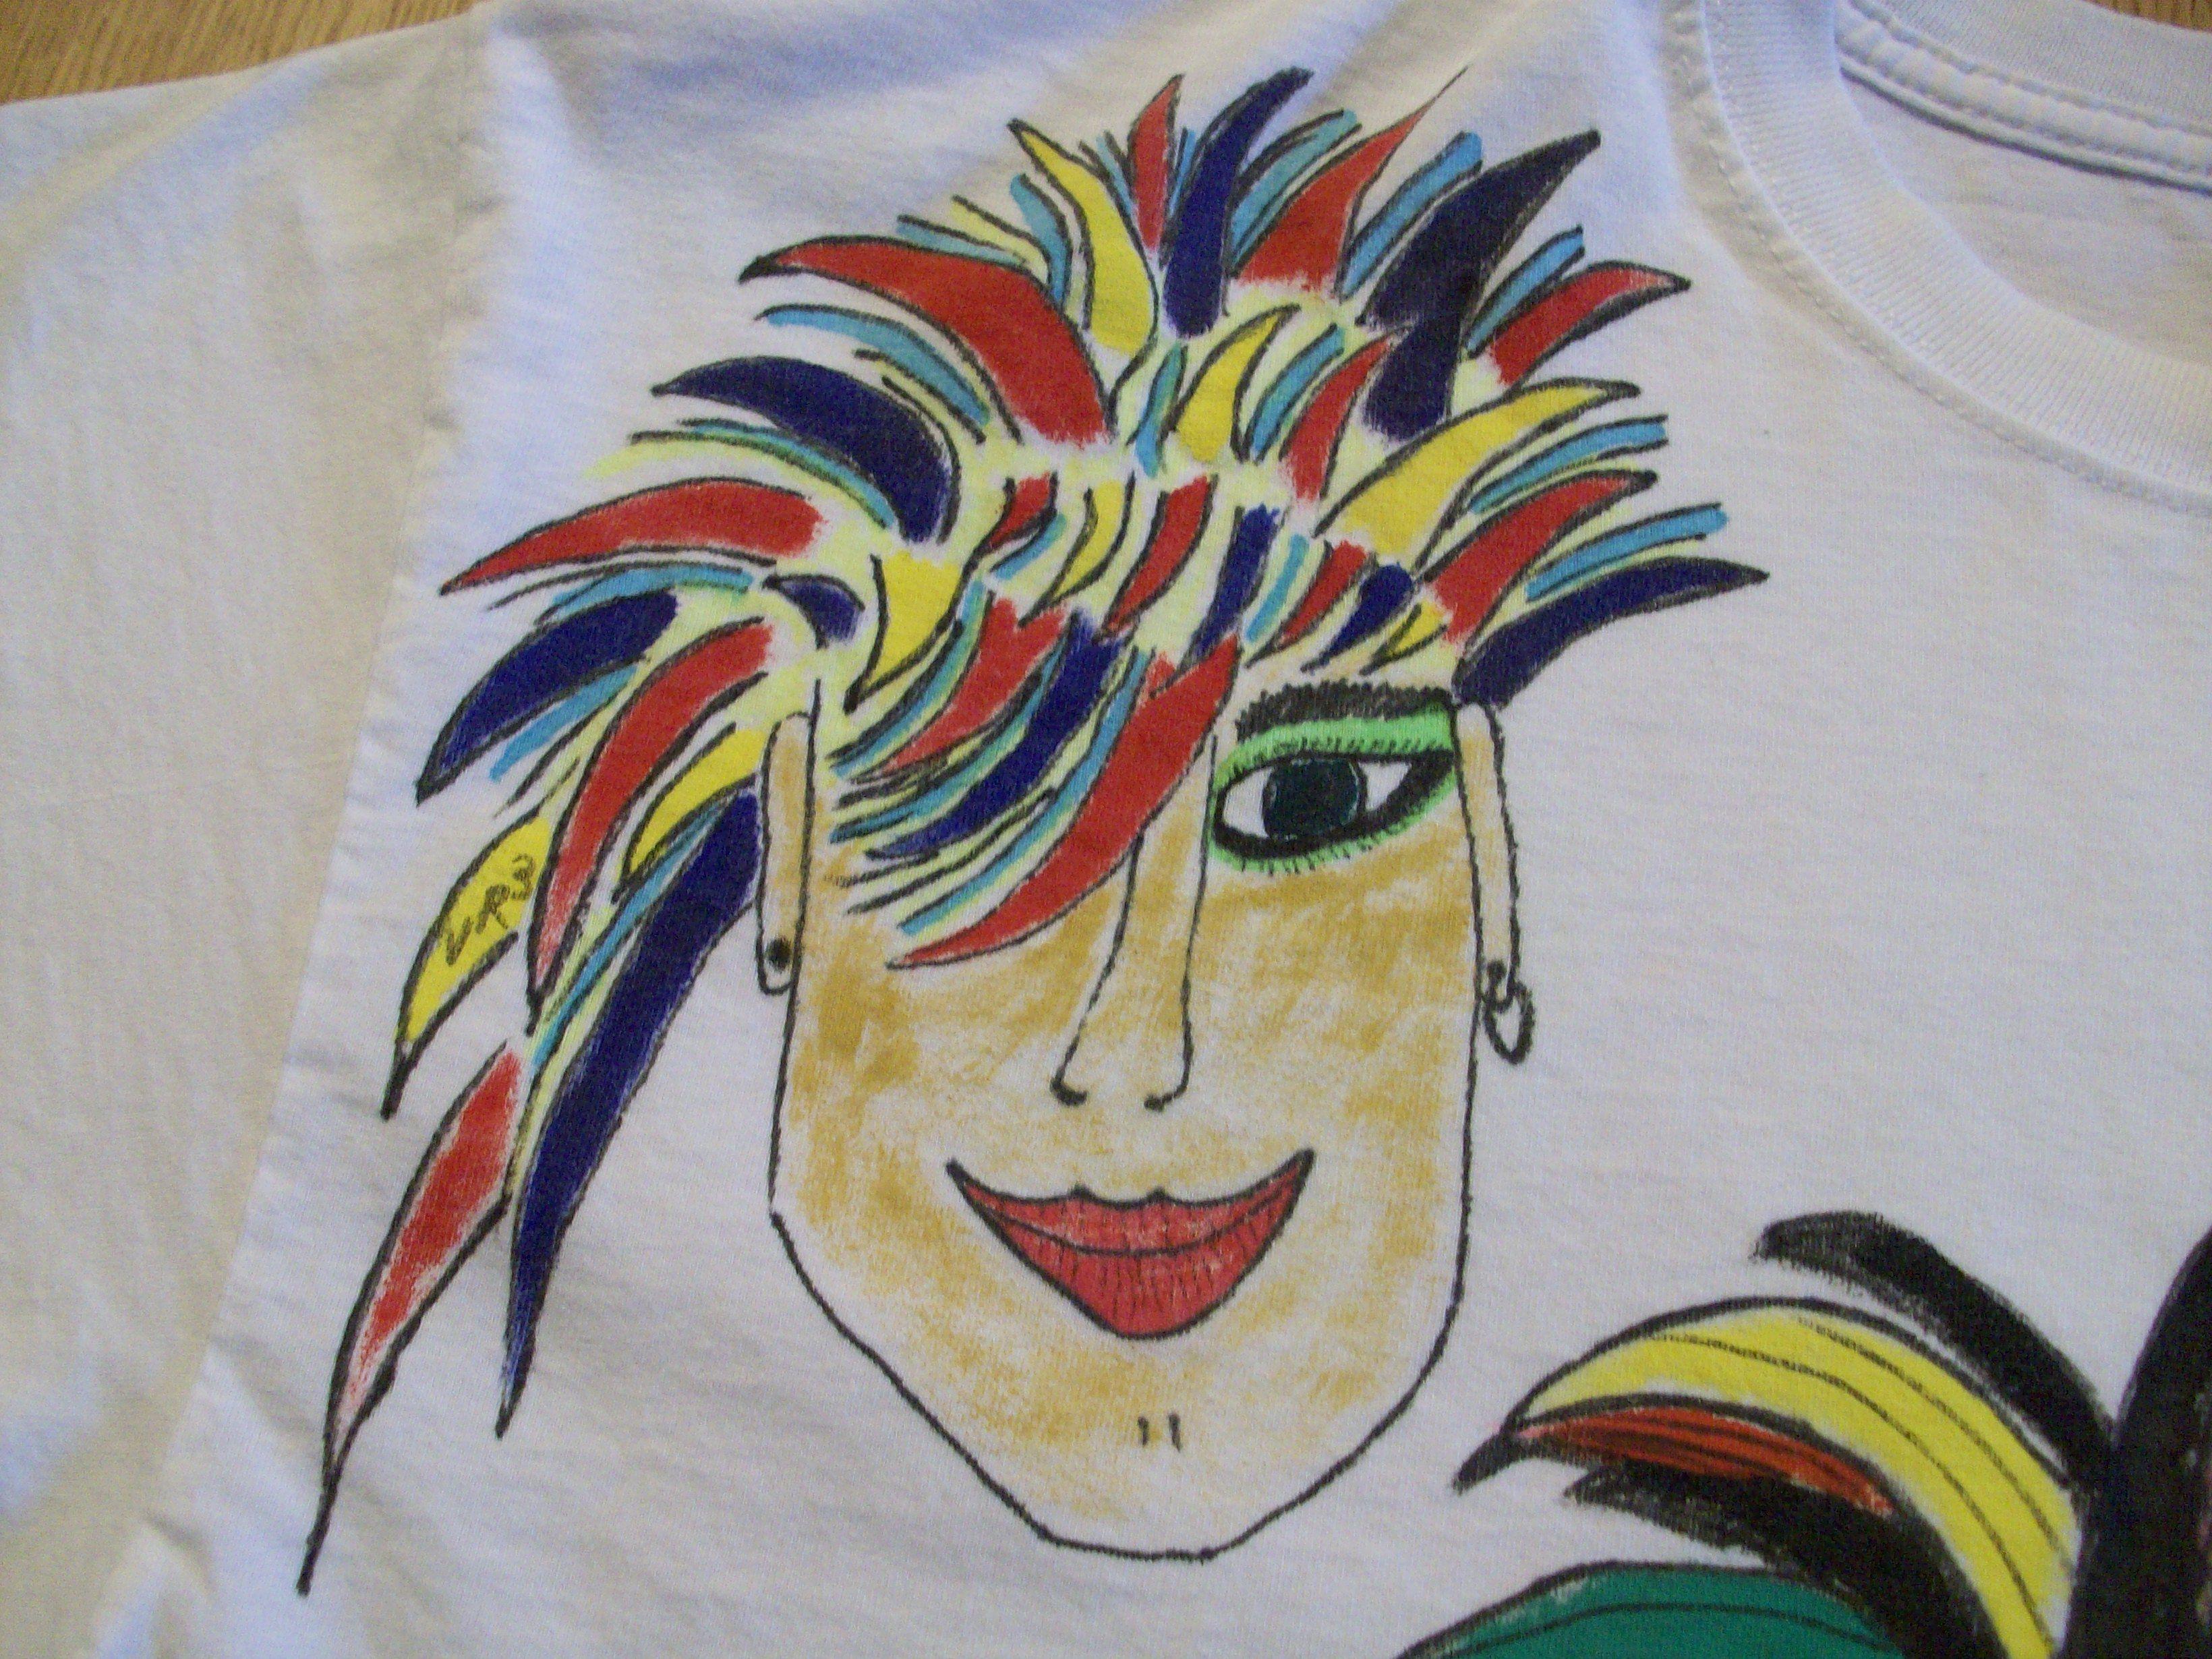 T Shirt - Original Art by Victoria